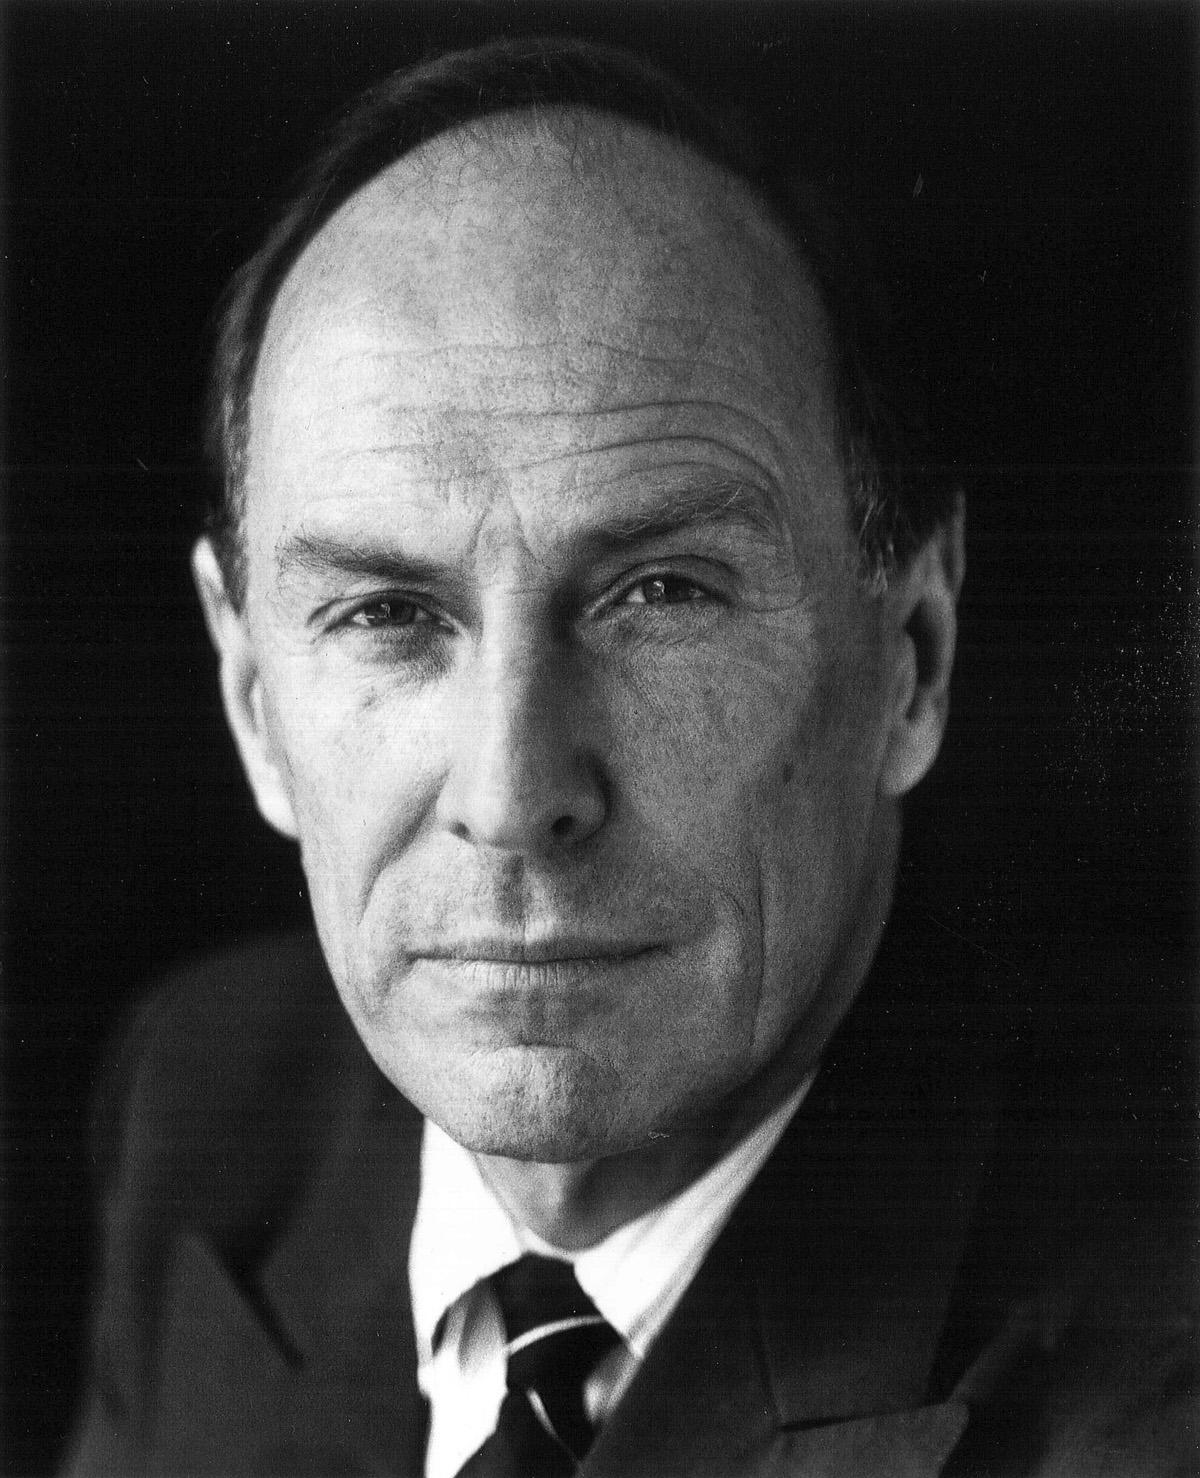 Paxton Whitehead (born 1937)